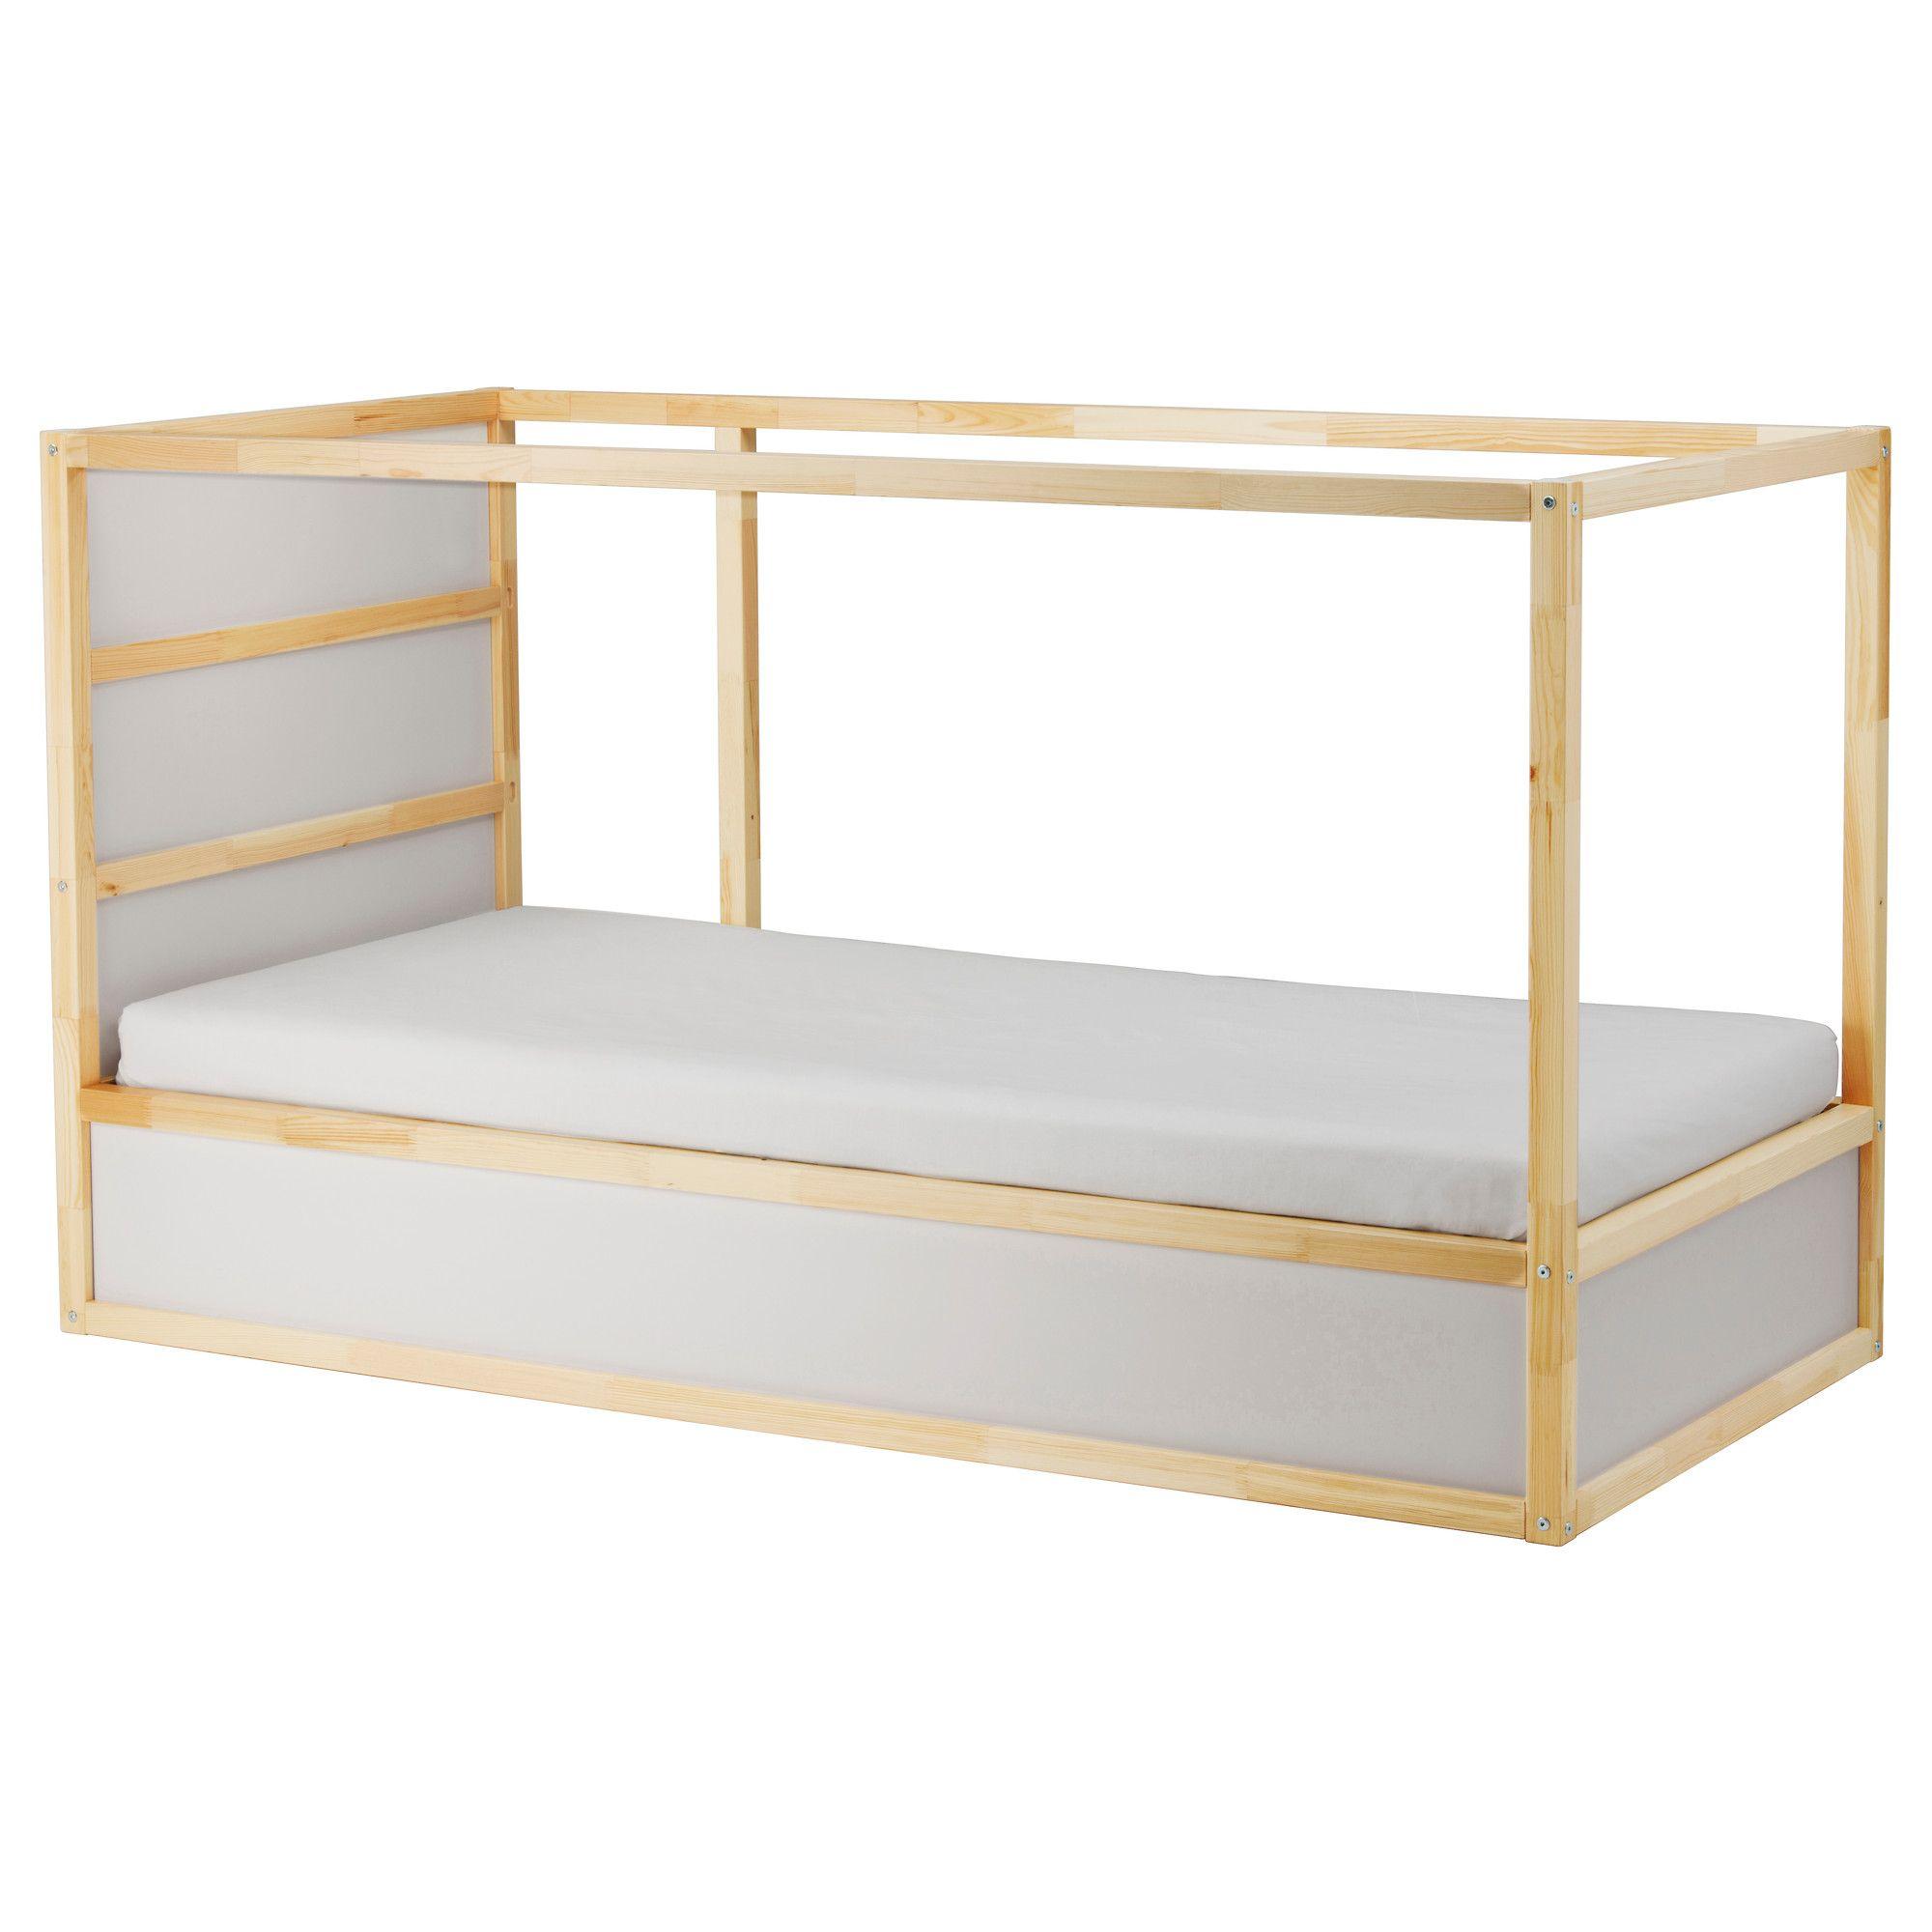 Ikea Kura White Pine Reversible Bed Loft Bed Frame Ikea Bed Kura Bed